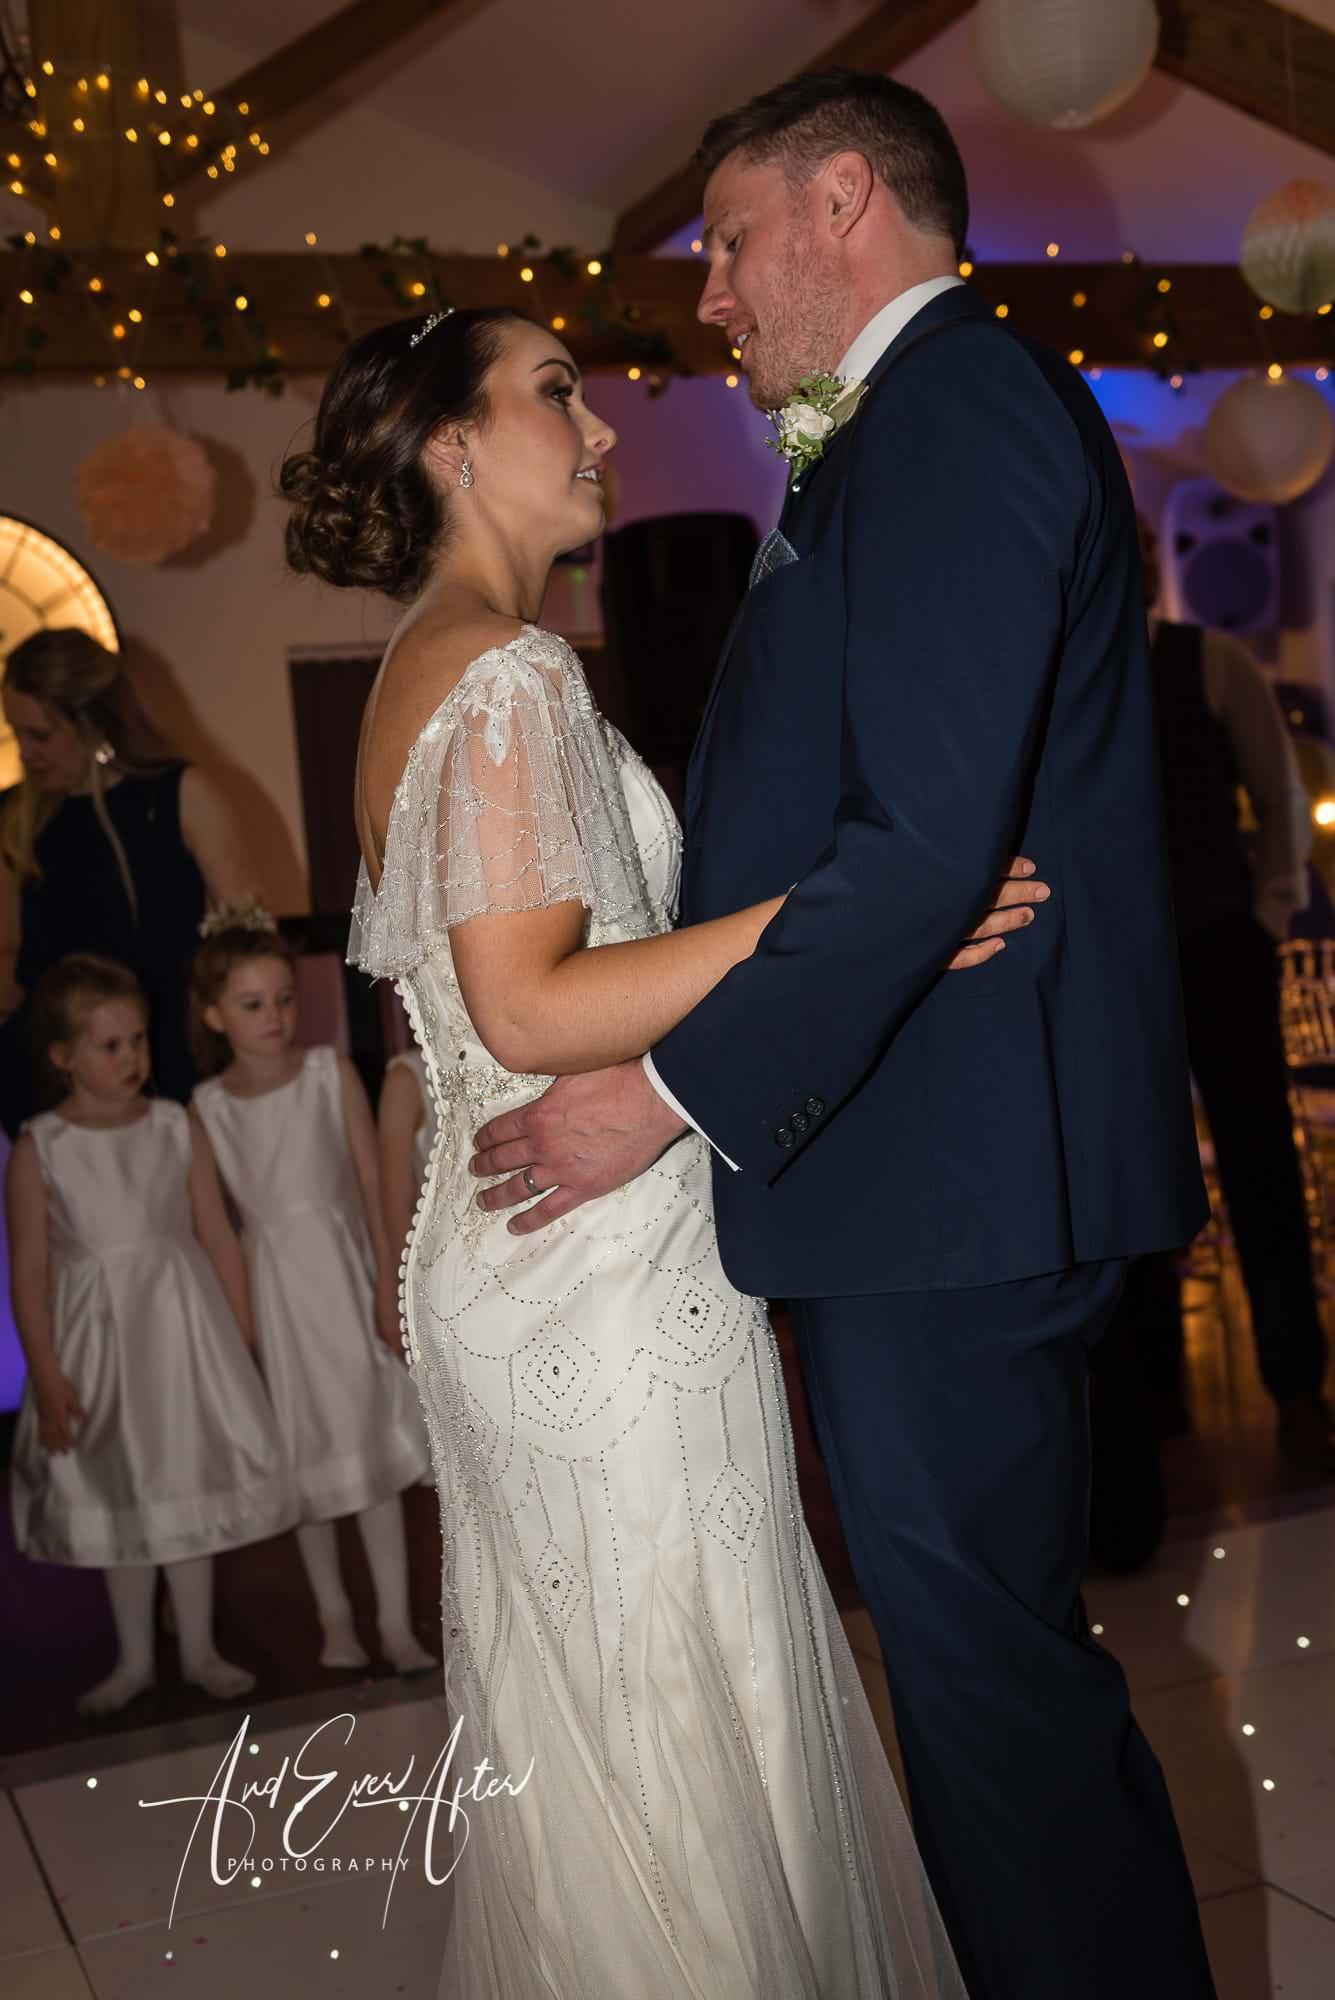 bride, groom, wedding day, love, wedding dance